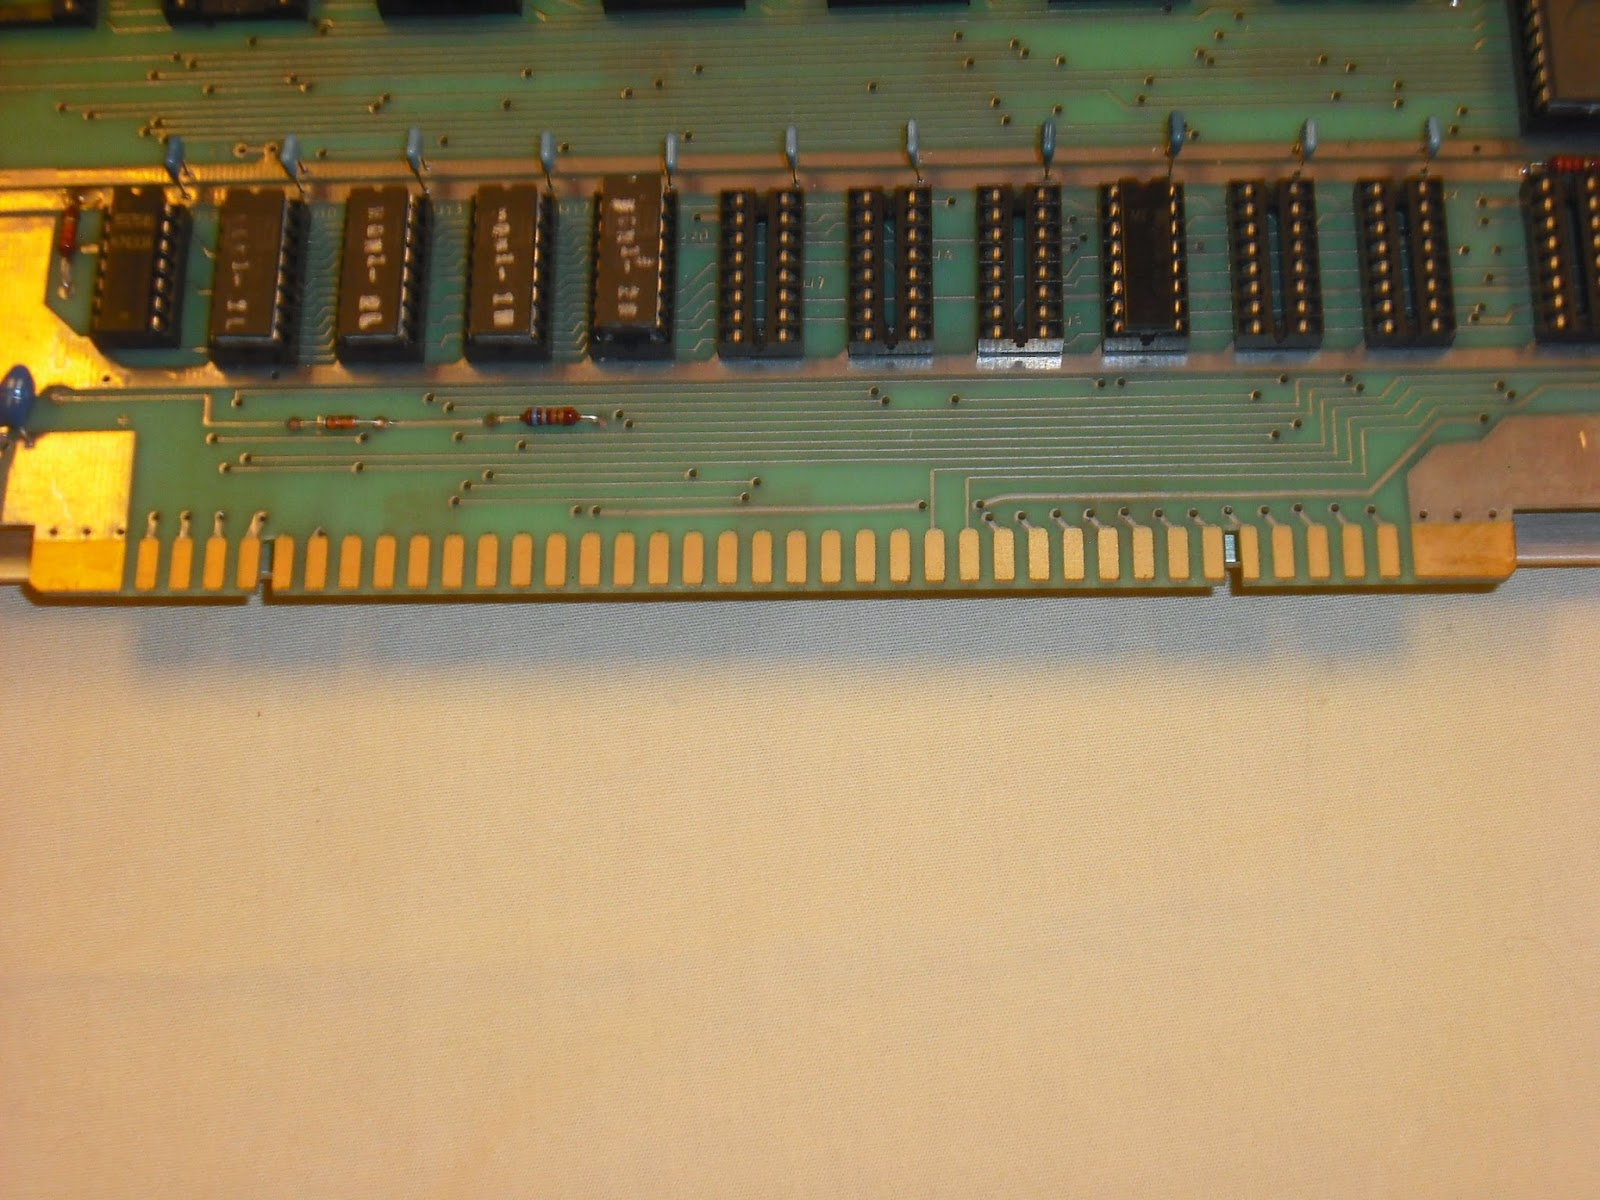 Micro 68 microcomputer